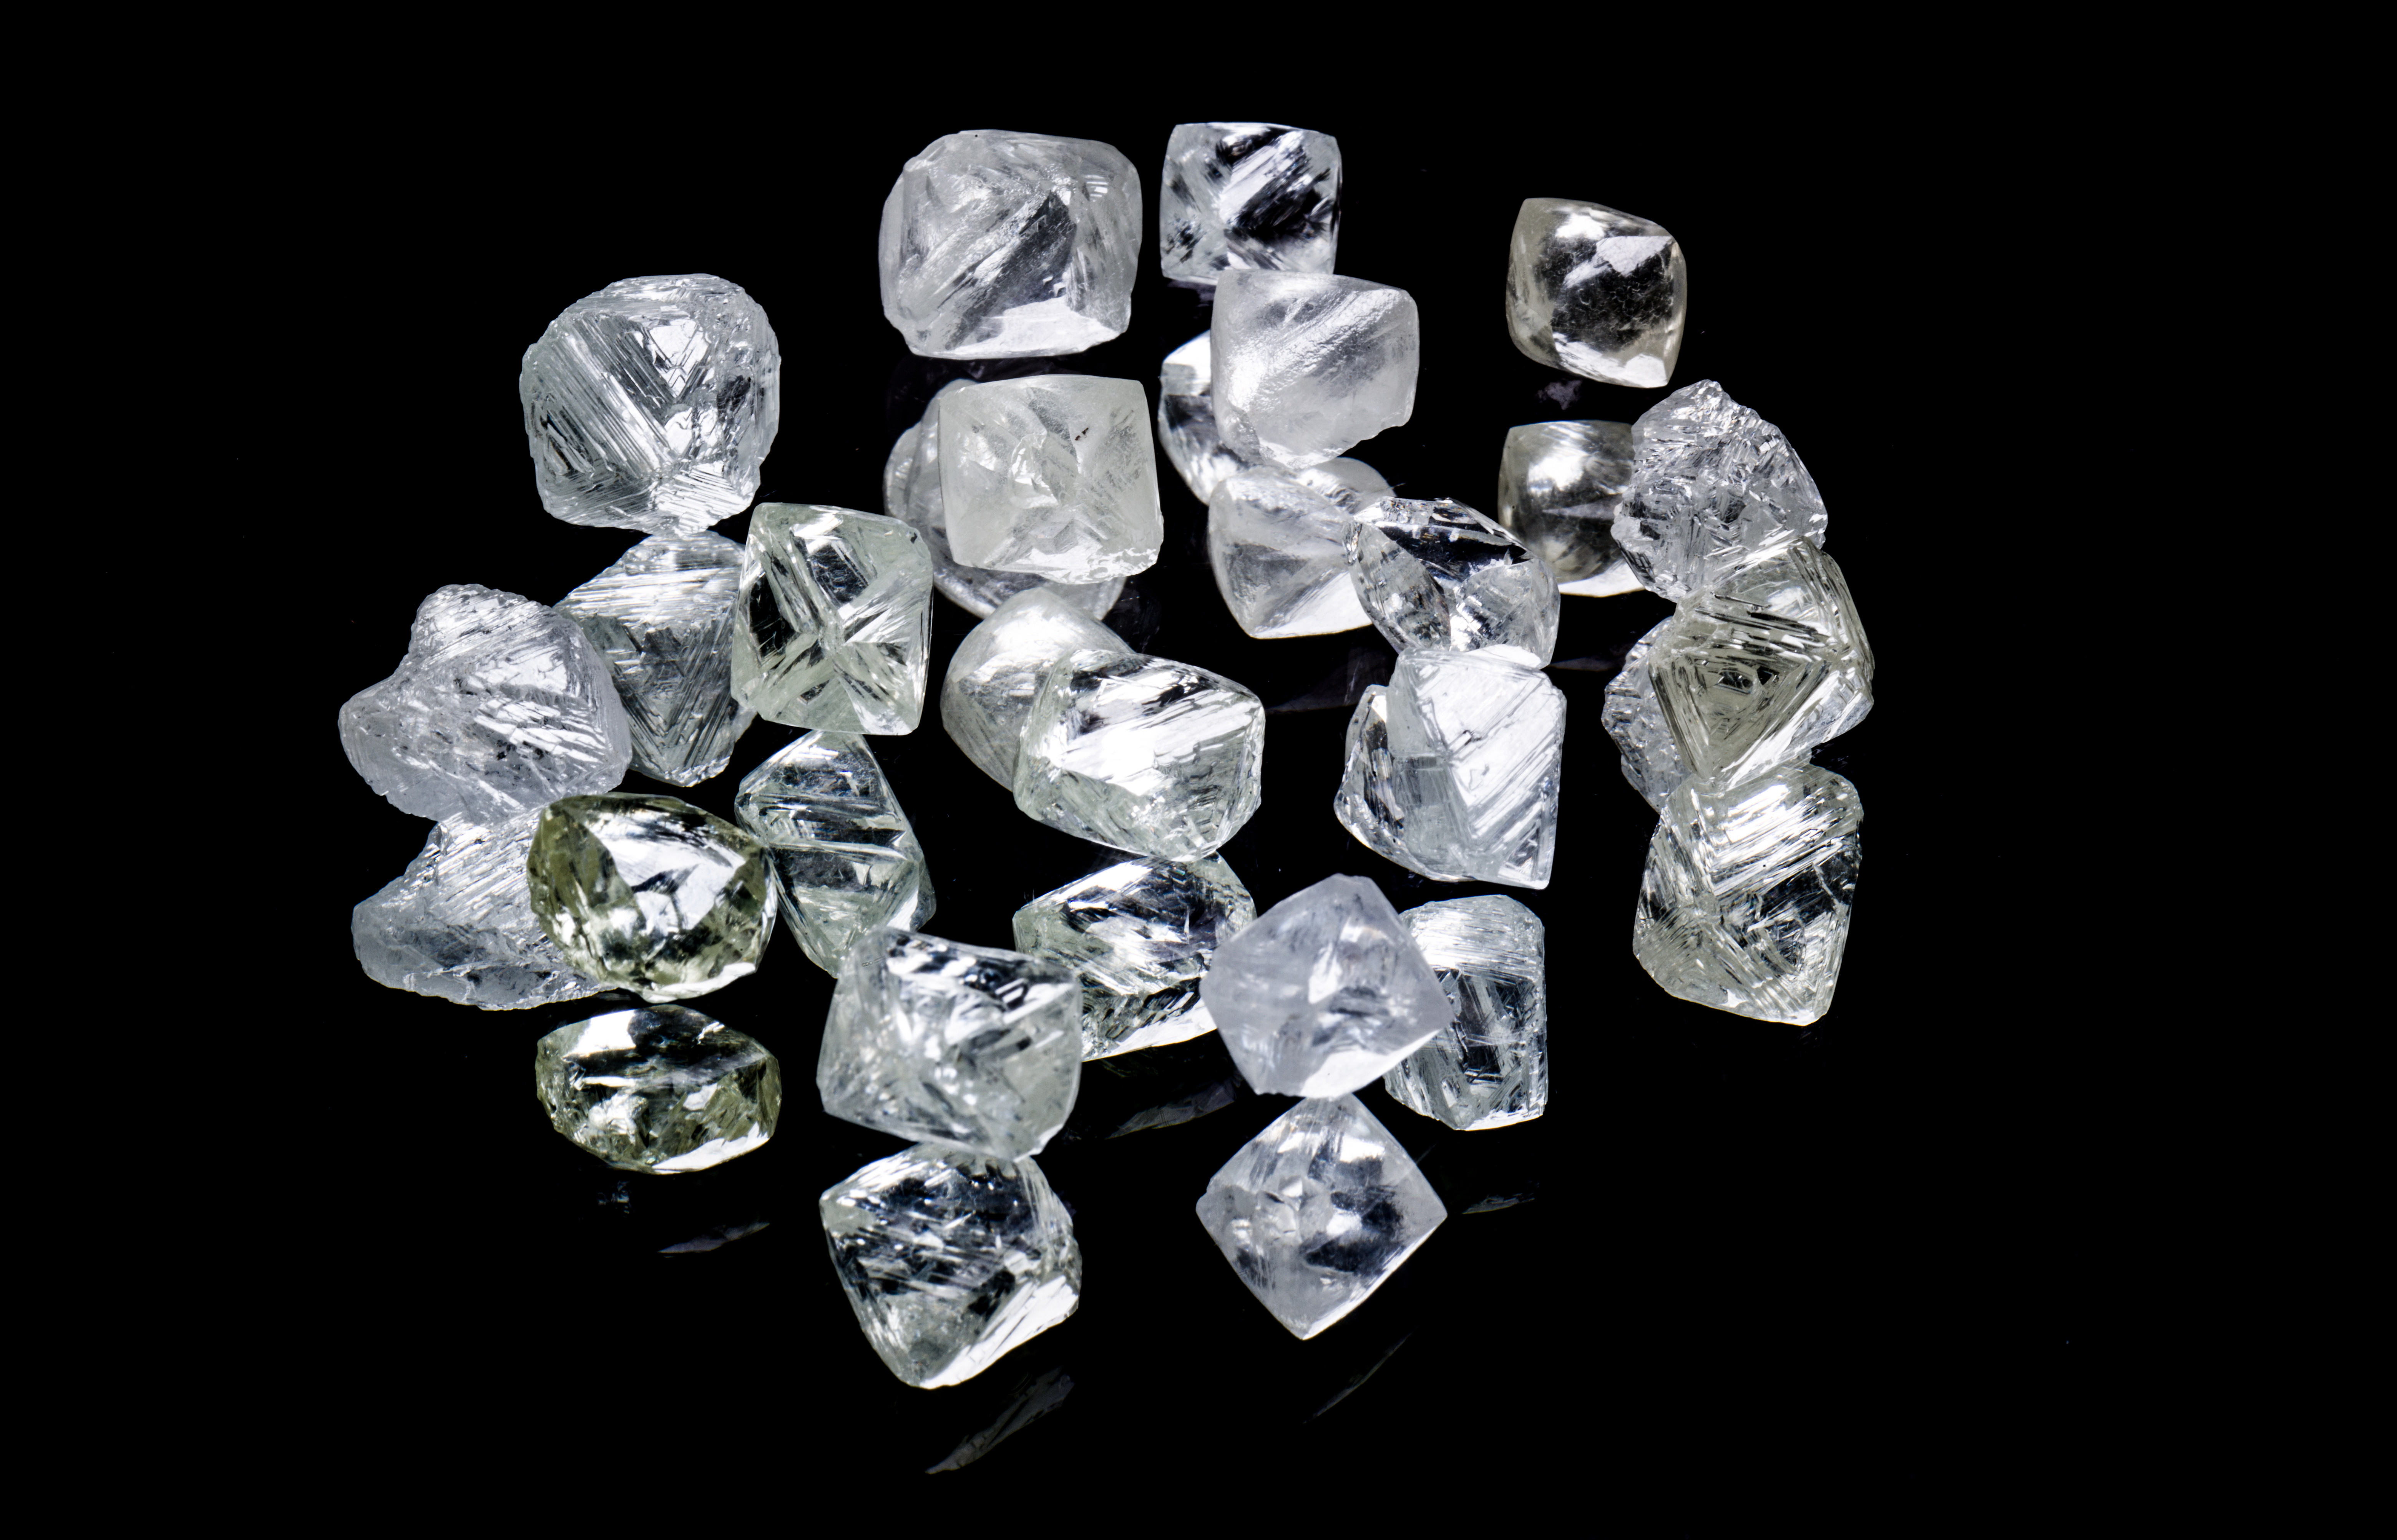 Diamond & Other Precious Gem Procurement